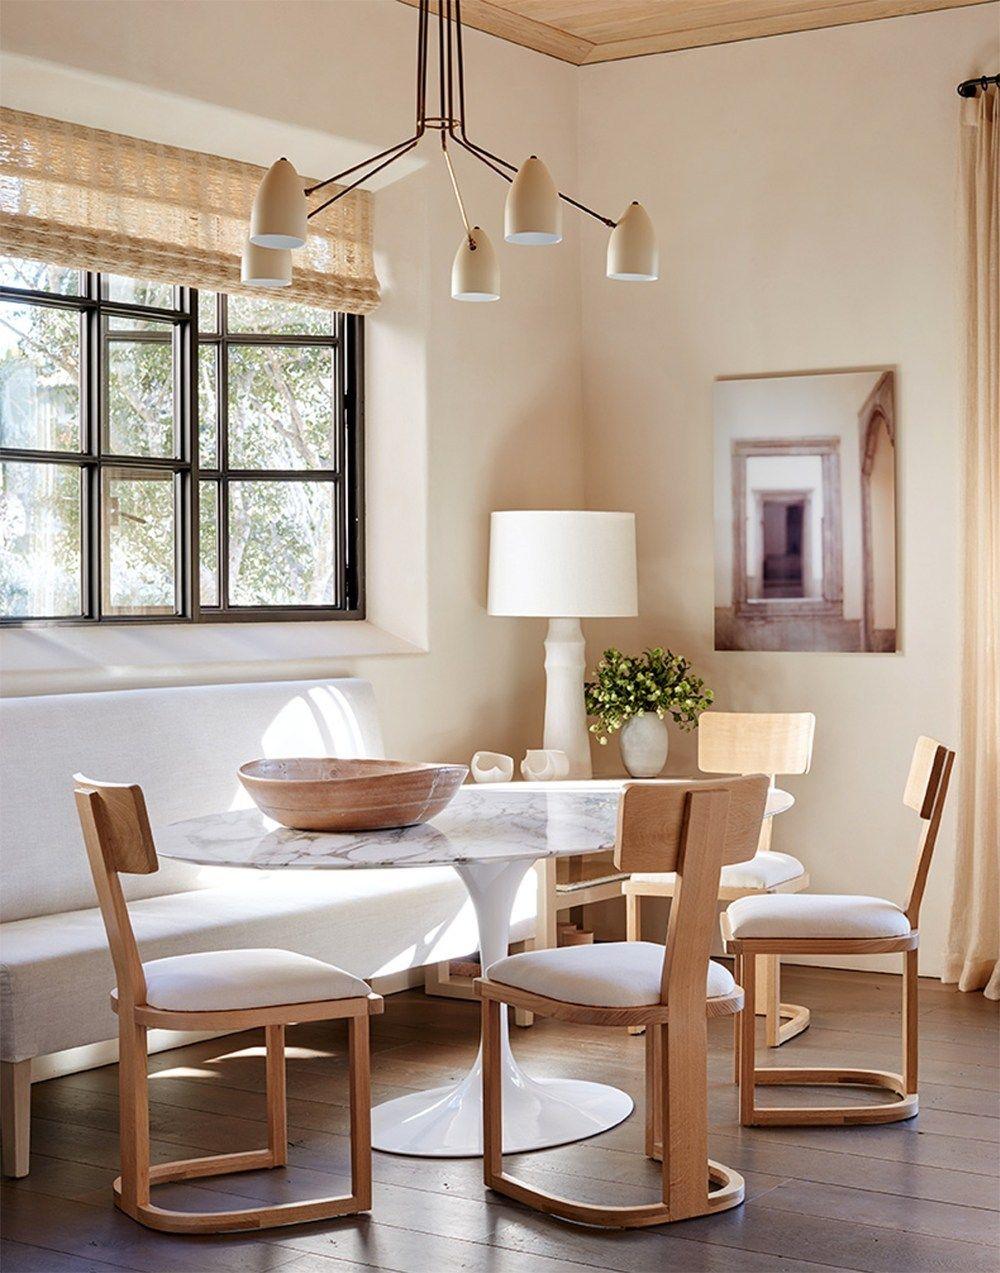 10 Pins Pinterest Inspiration Room For Tuesday Blog Home Decor Dining Room Inspiration House Interior